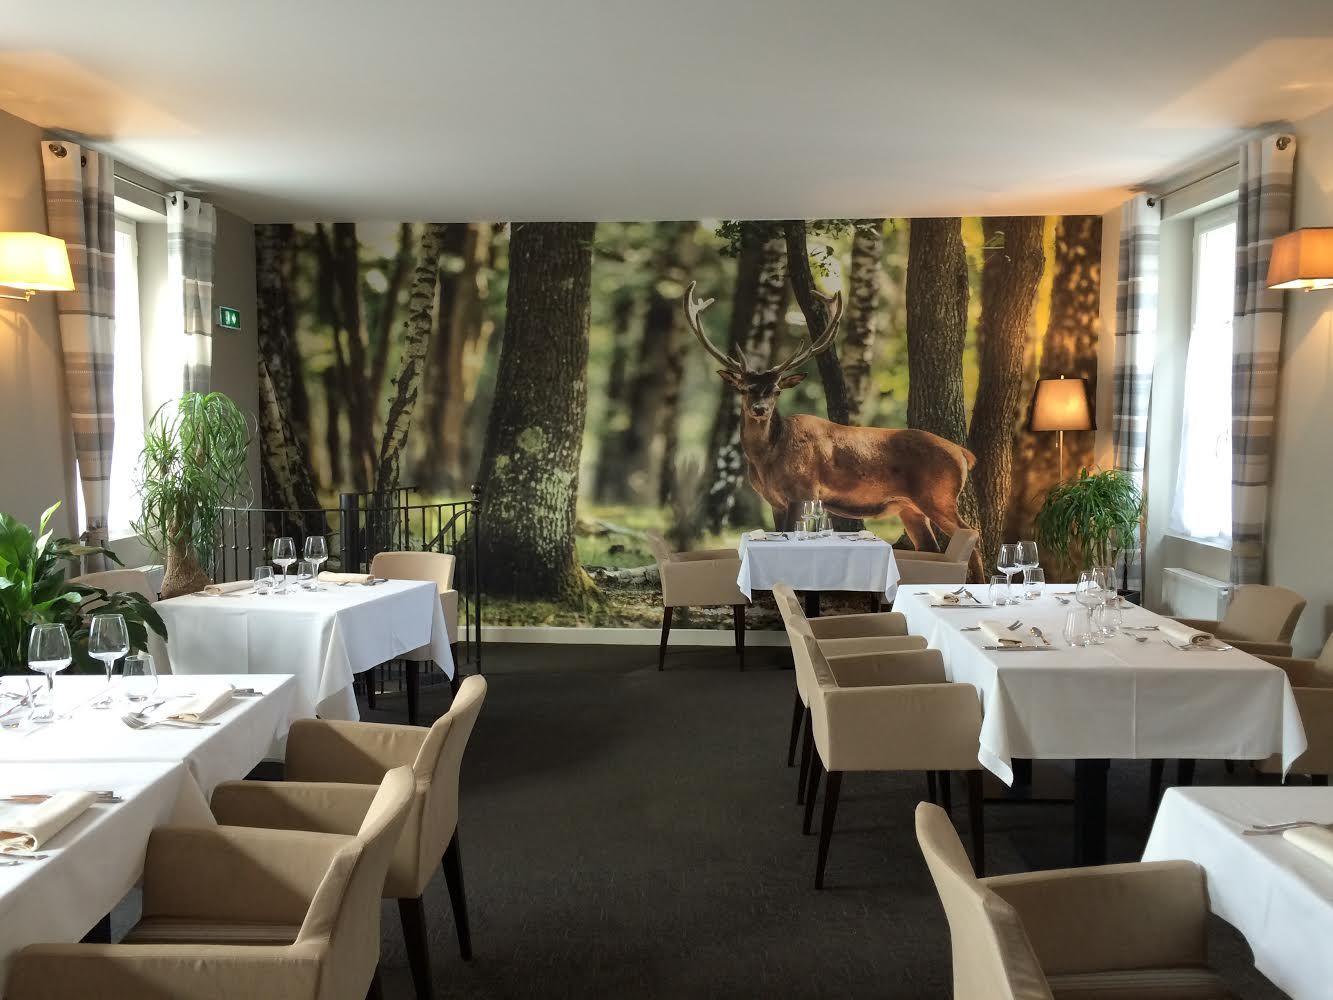 deco restaurant campagne 78 | restaurant campagne chic | Outdoor ...